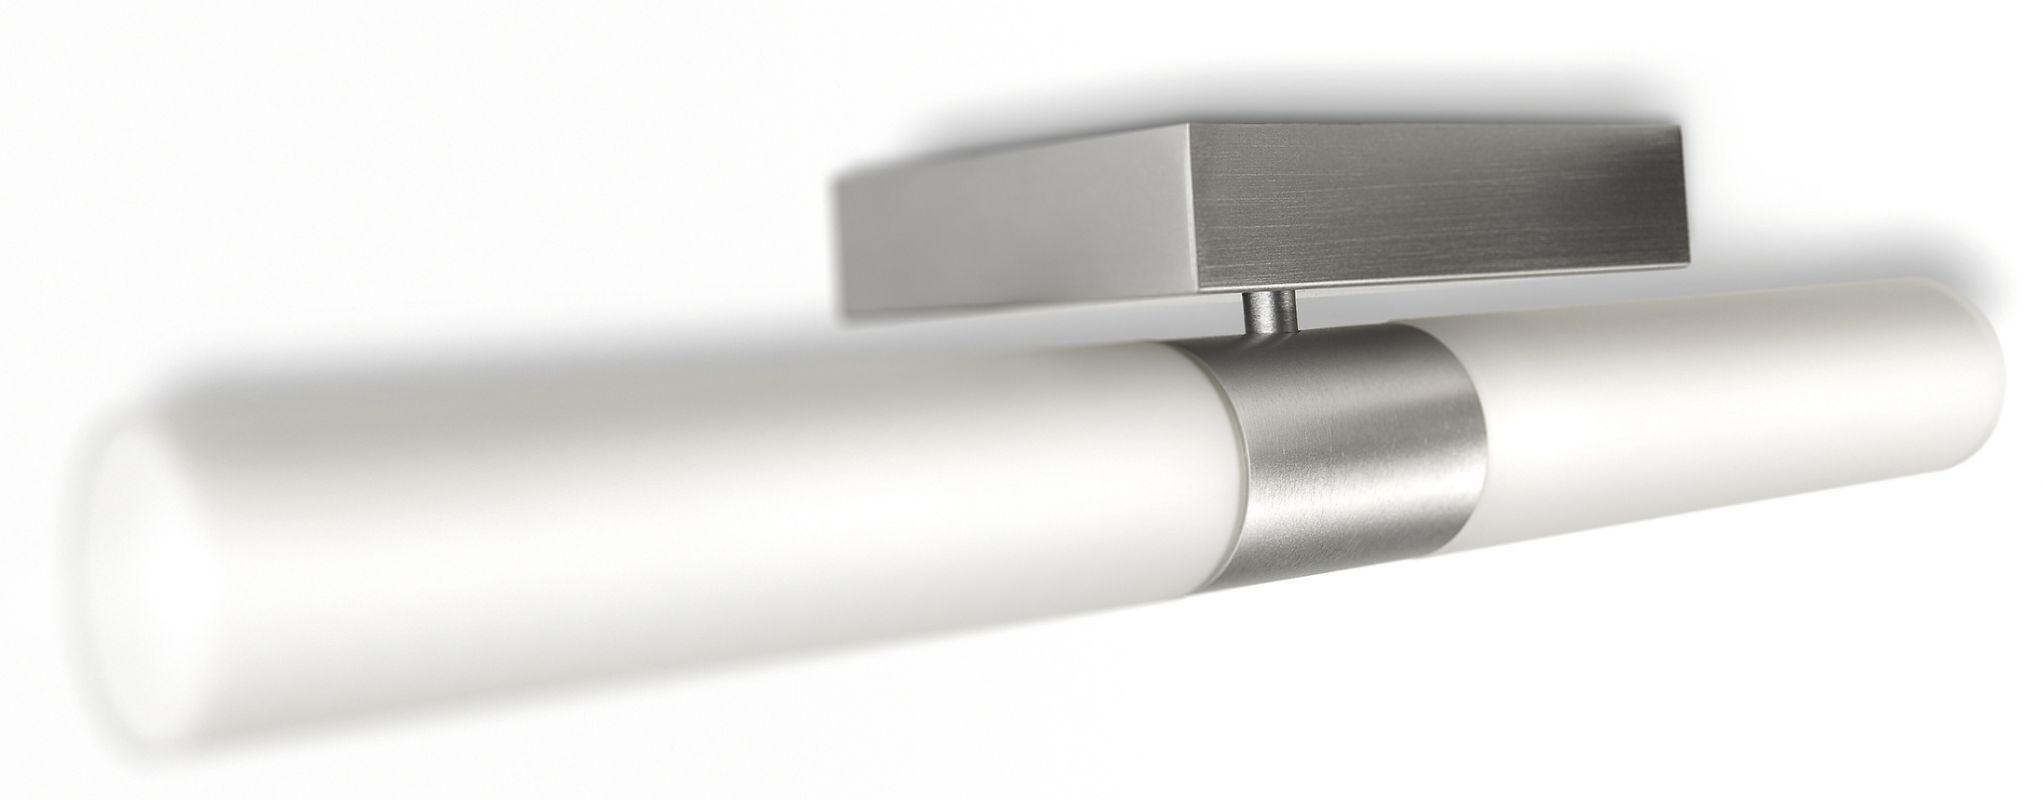 Philips 36801 1 Light Fluorescent Semi-Flush Mount Ceiling Fixture